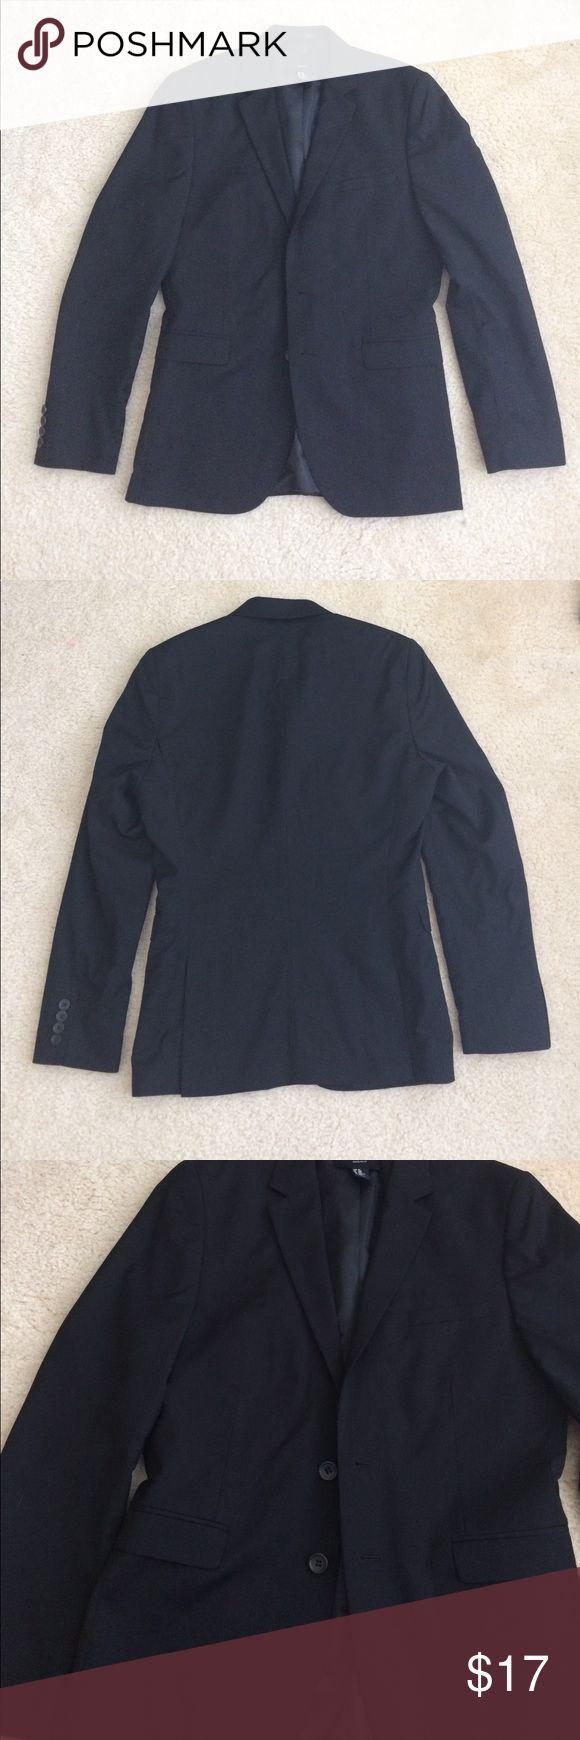 Best 25  Black sport coat ideas on Pinterest   Casual sport coats ...